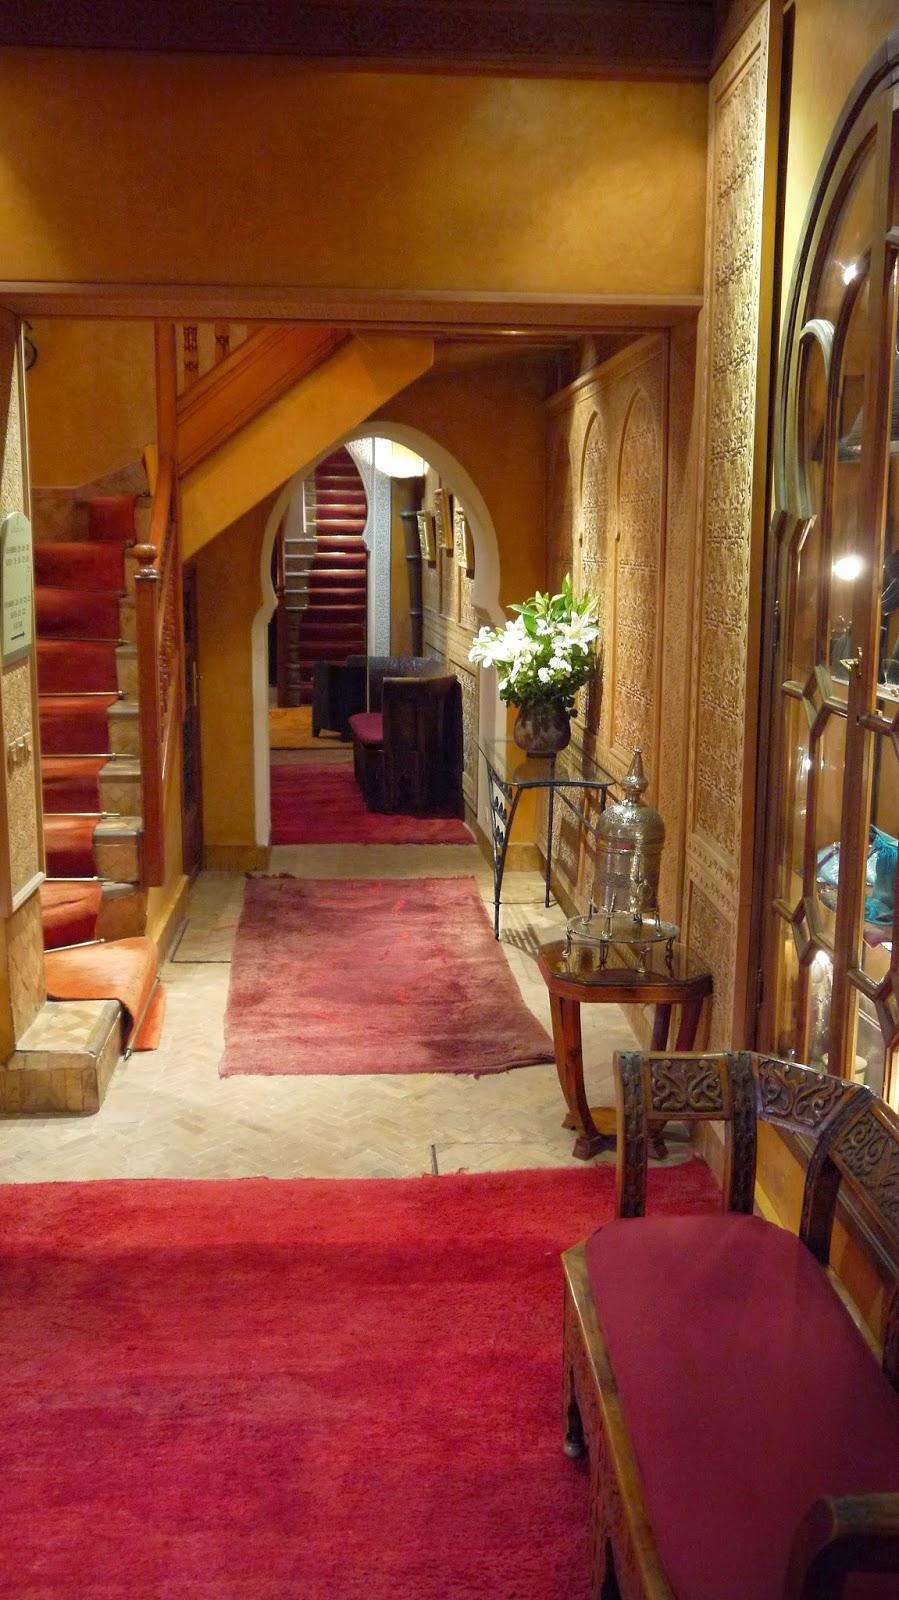 La maison arabe a luxurious historical retreat in for Architecture maison arabe